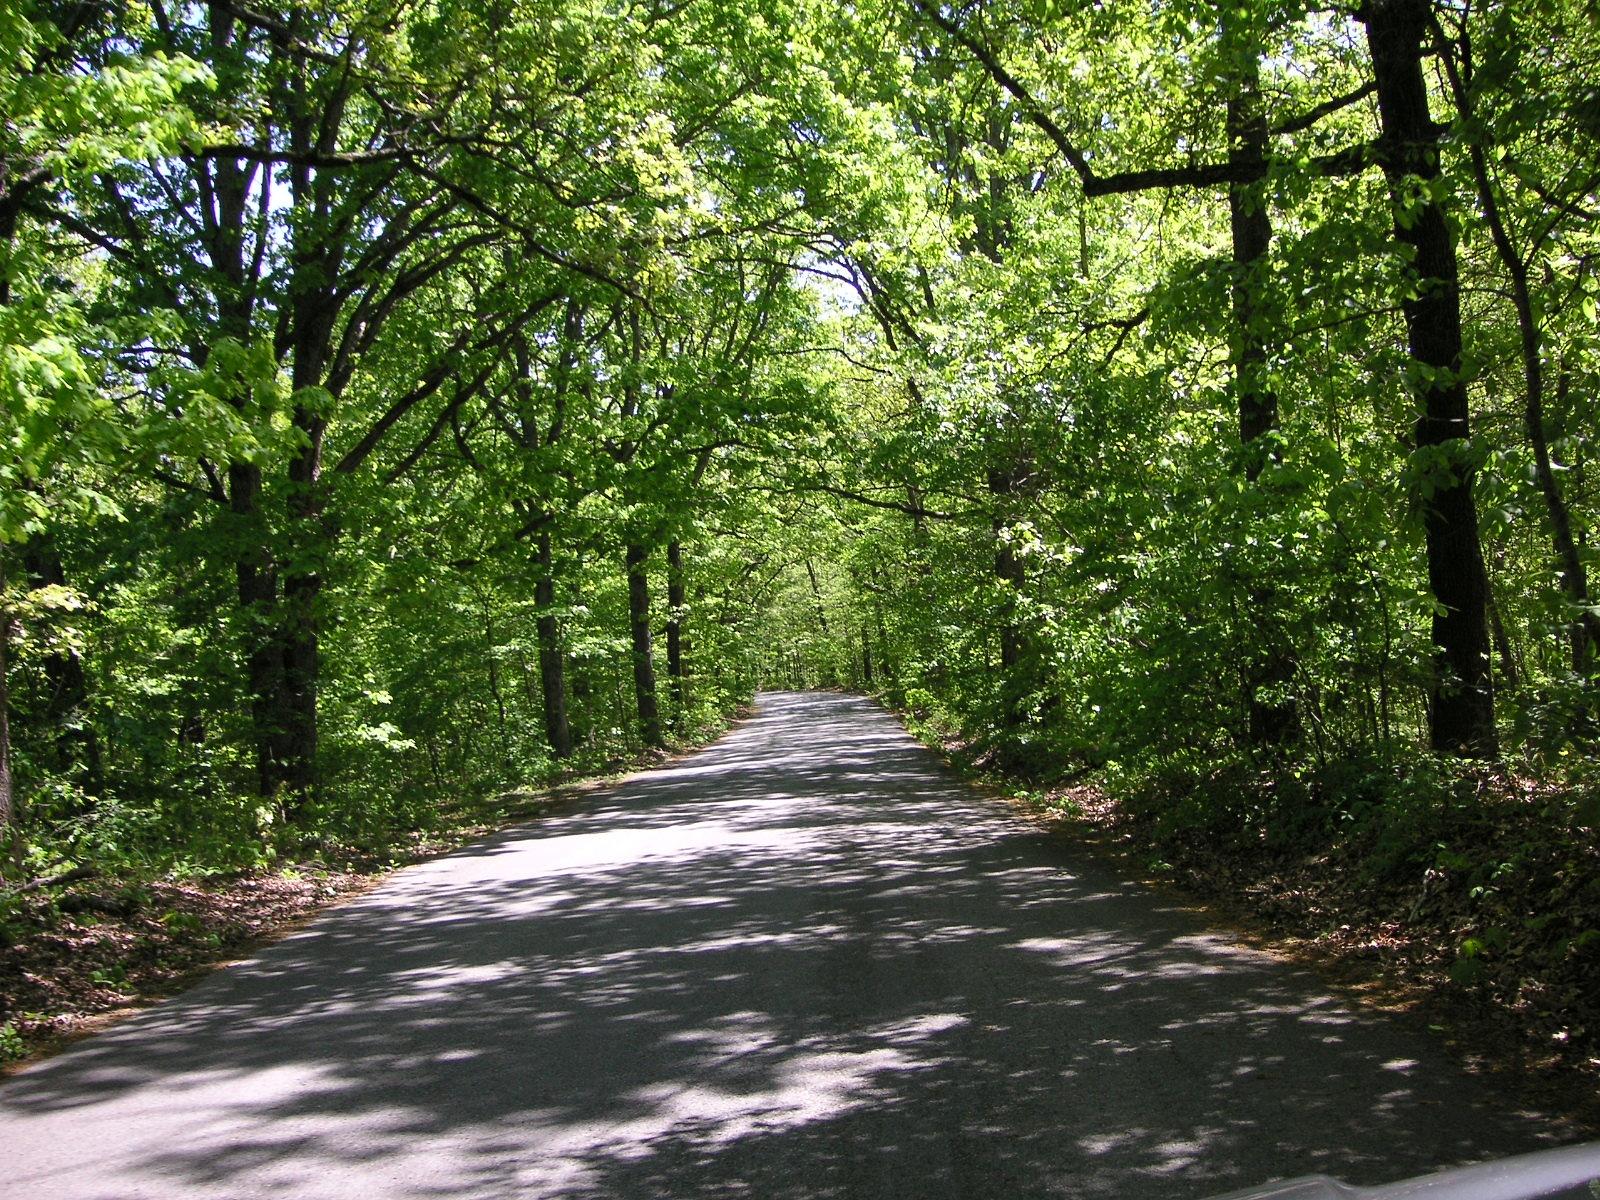 My Driveway by RichardCressy